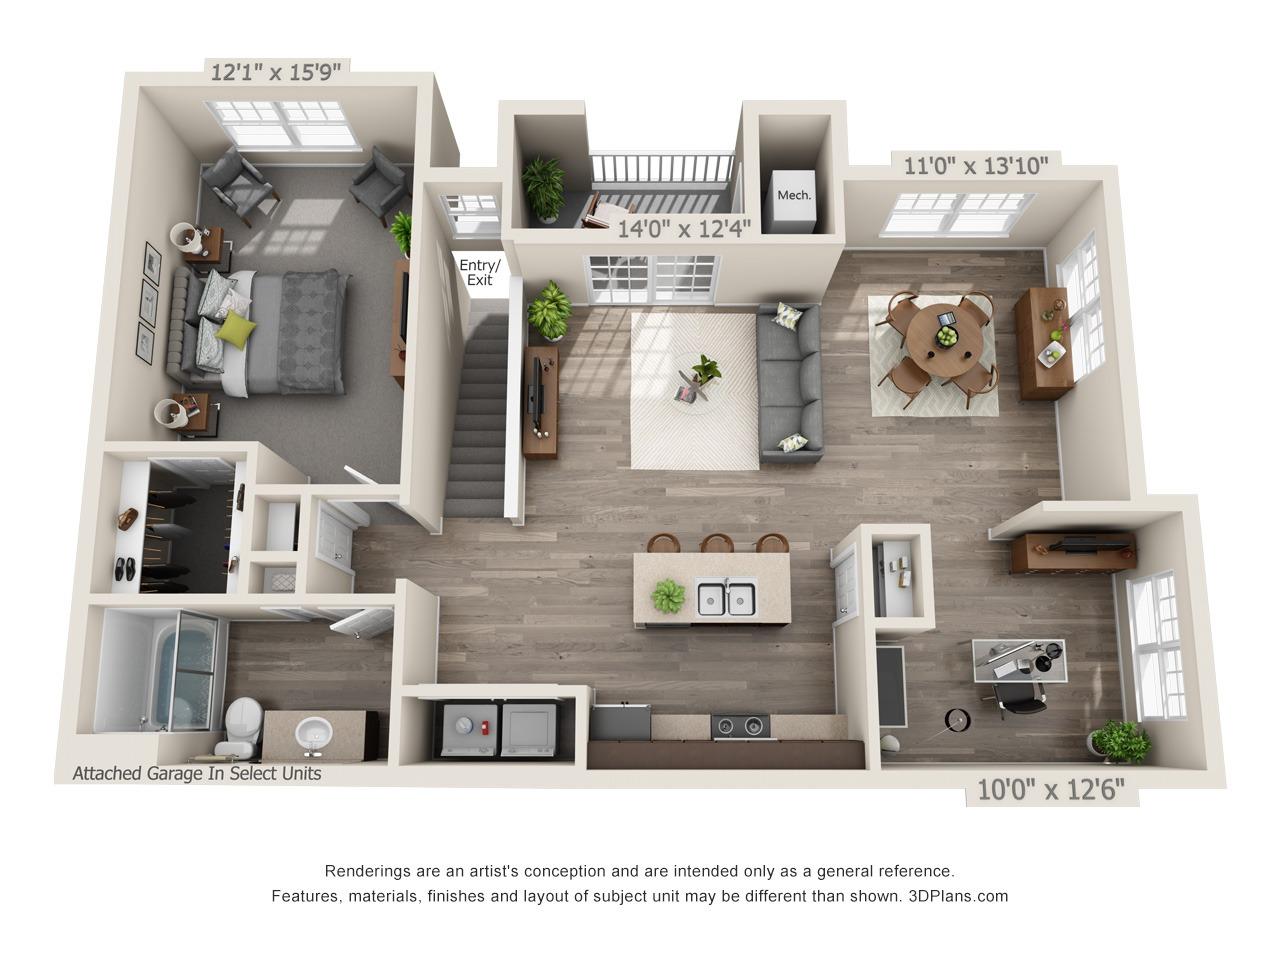 B2 - 1 Bed / 1 Bath and Den - 2nd Floor - 1,073 SF